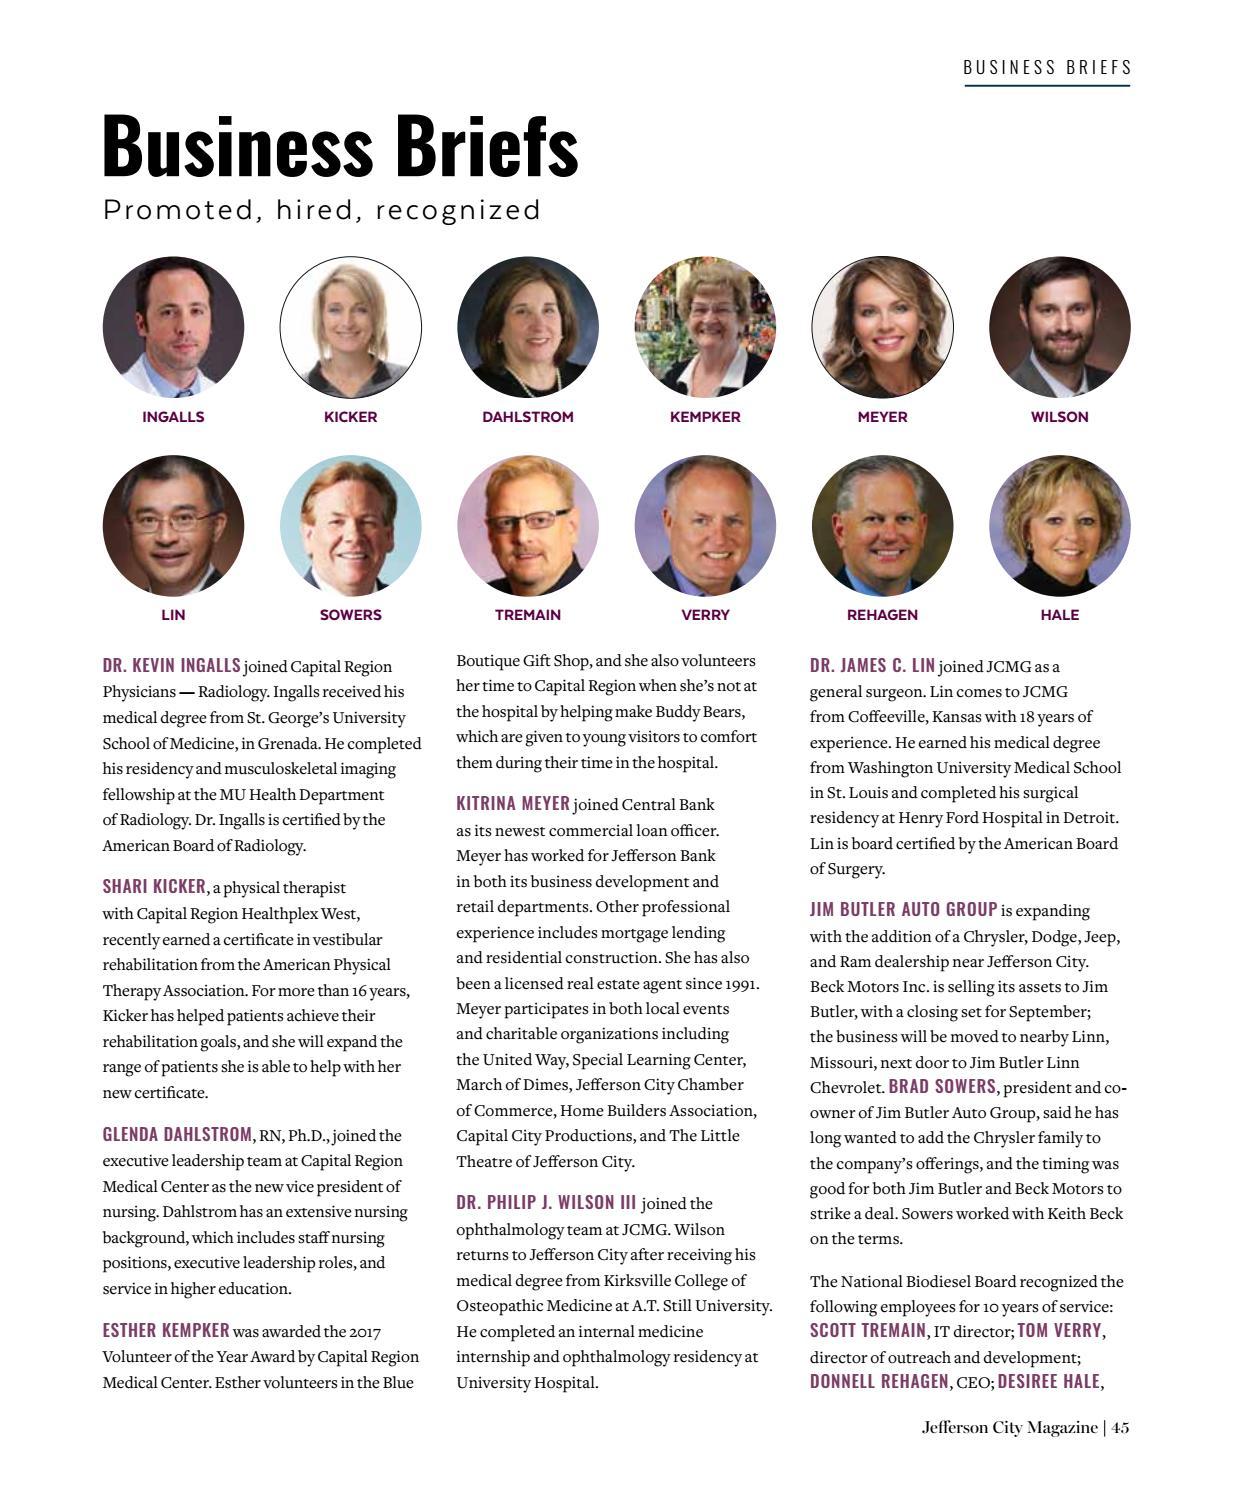 Jefferson City Magazine - September/October 2017 by Business